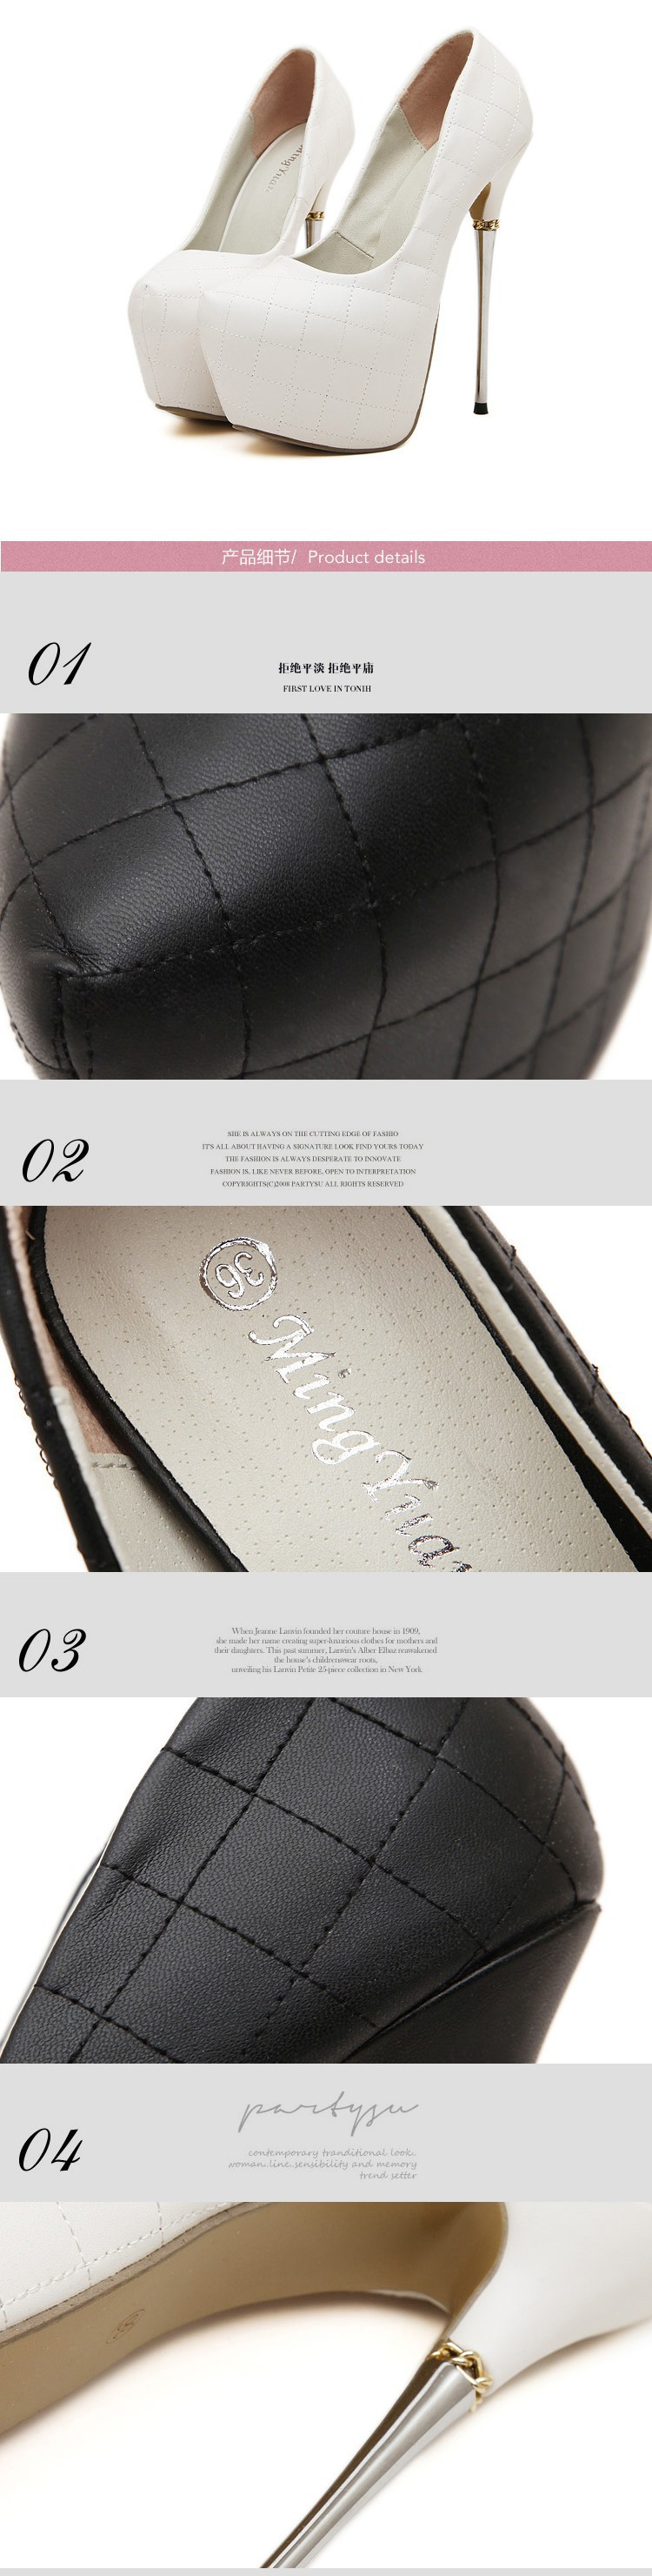 womens high heels shoes 2016 white pumps women party shoes platform ... cb66b7a4aef7